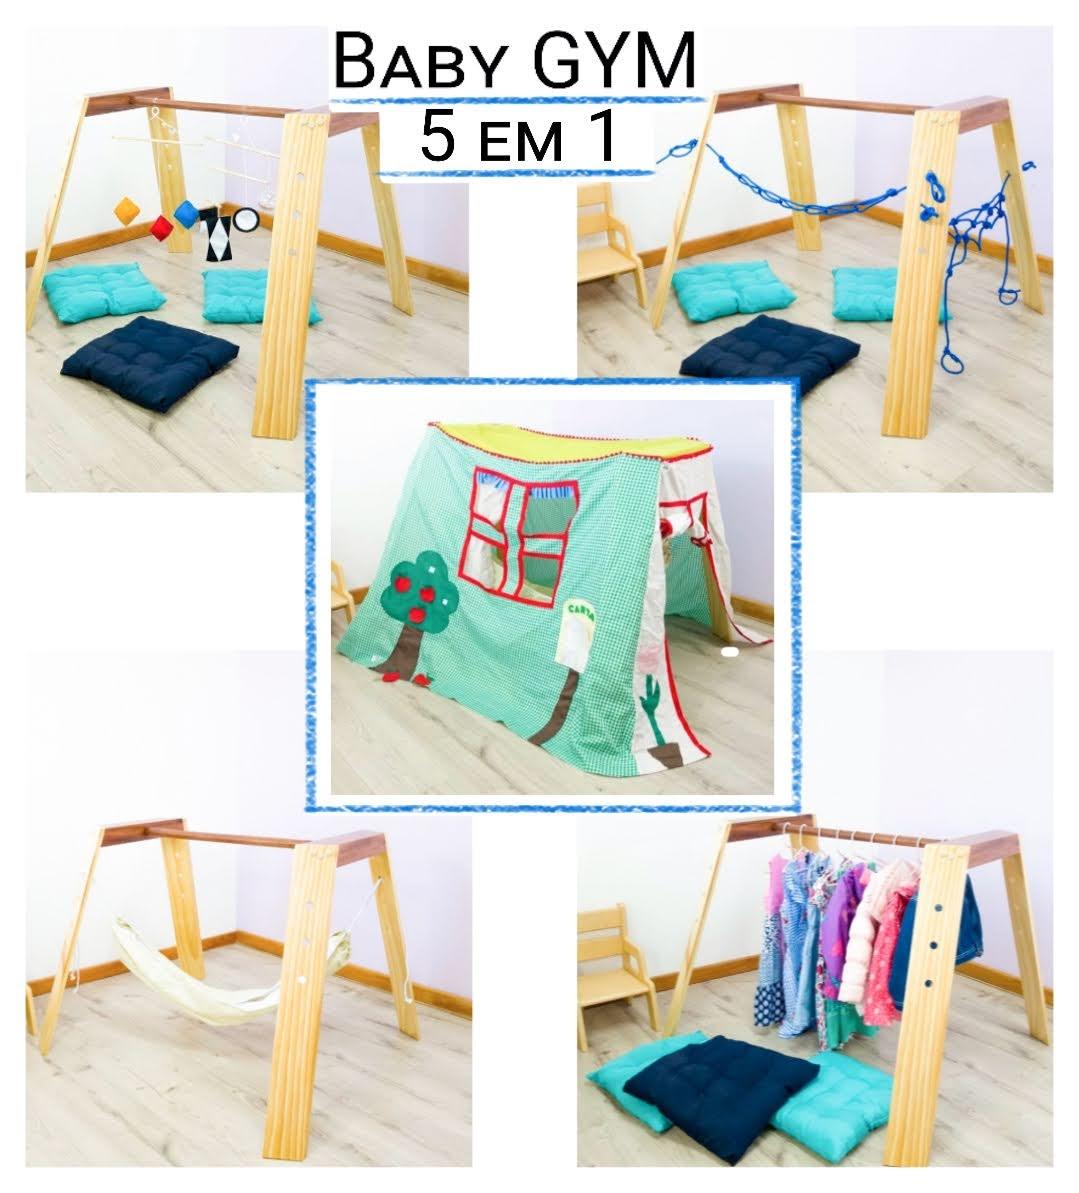 Baby Gym Montessori Kit 5 em 1